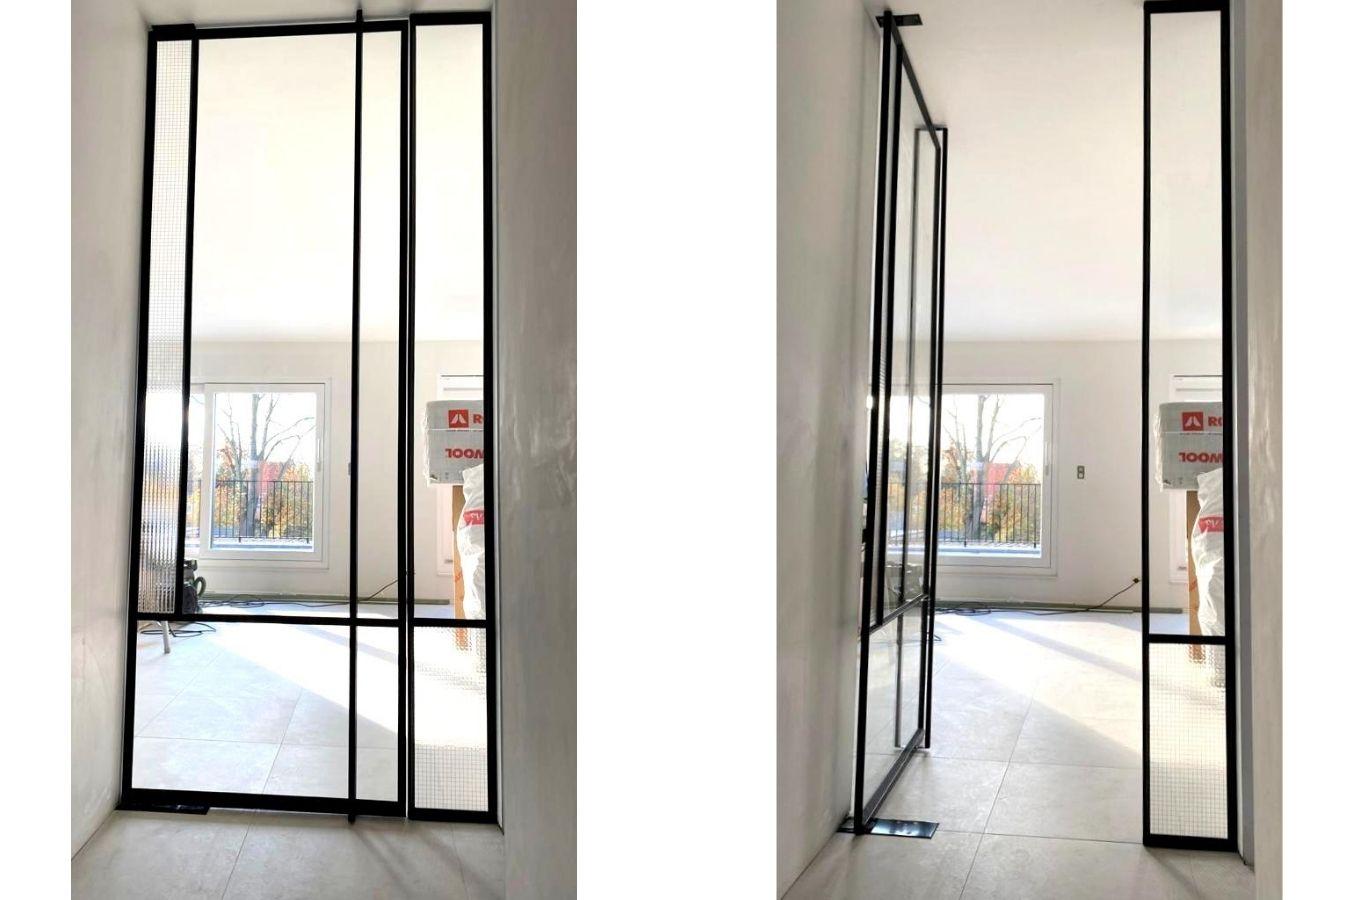 pivotdeur met glas, project Mol, StalenDeurenHuys